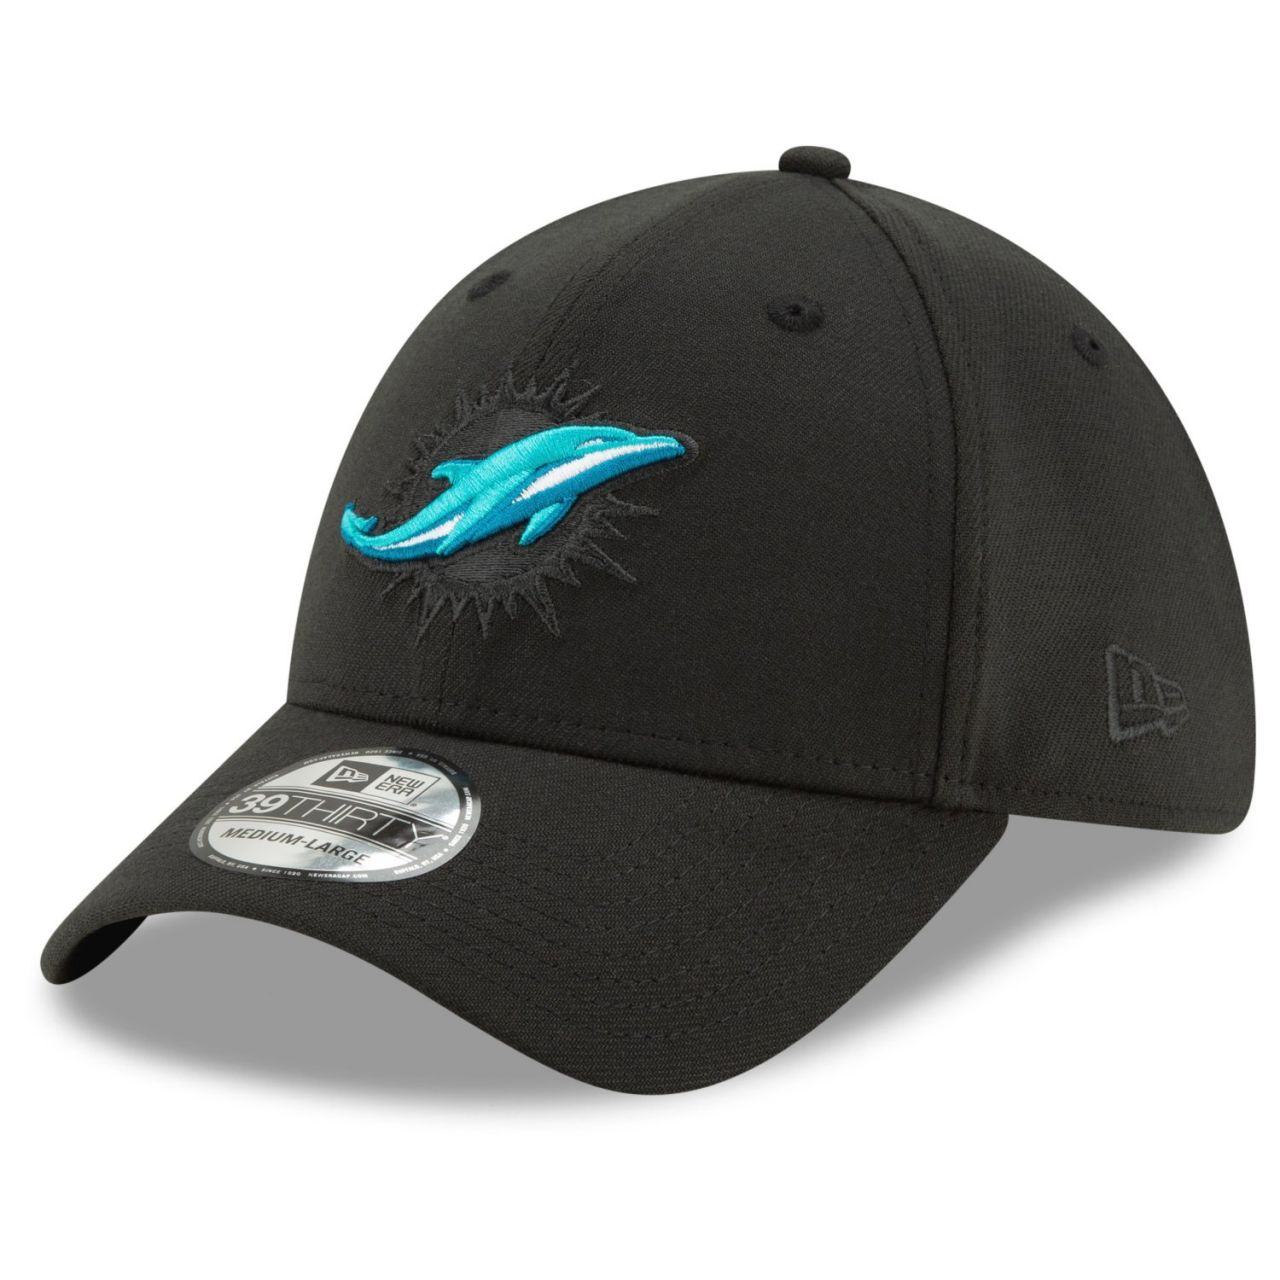 amfoo - New Era 39Thirty Stretch Cap - ELEMENTS Miami Dolphins